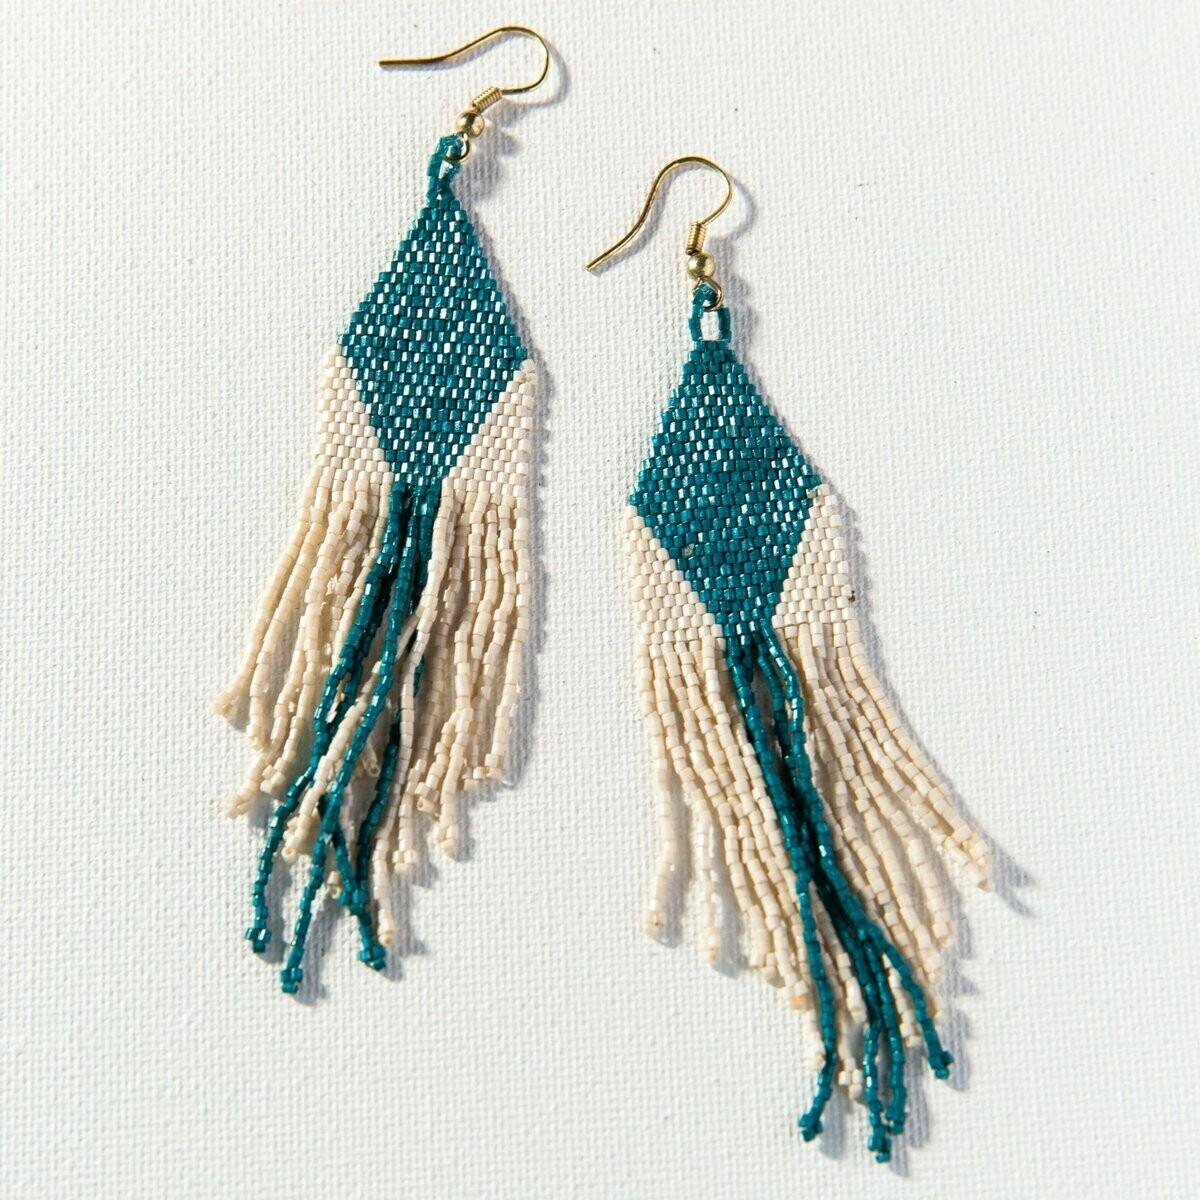 Ink & Alloy 913 Earring Peacock